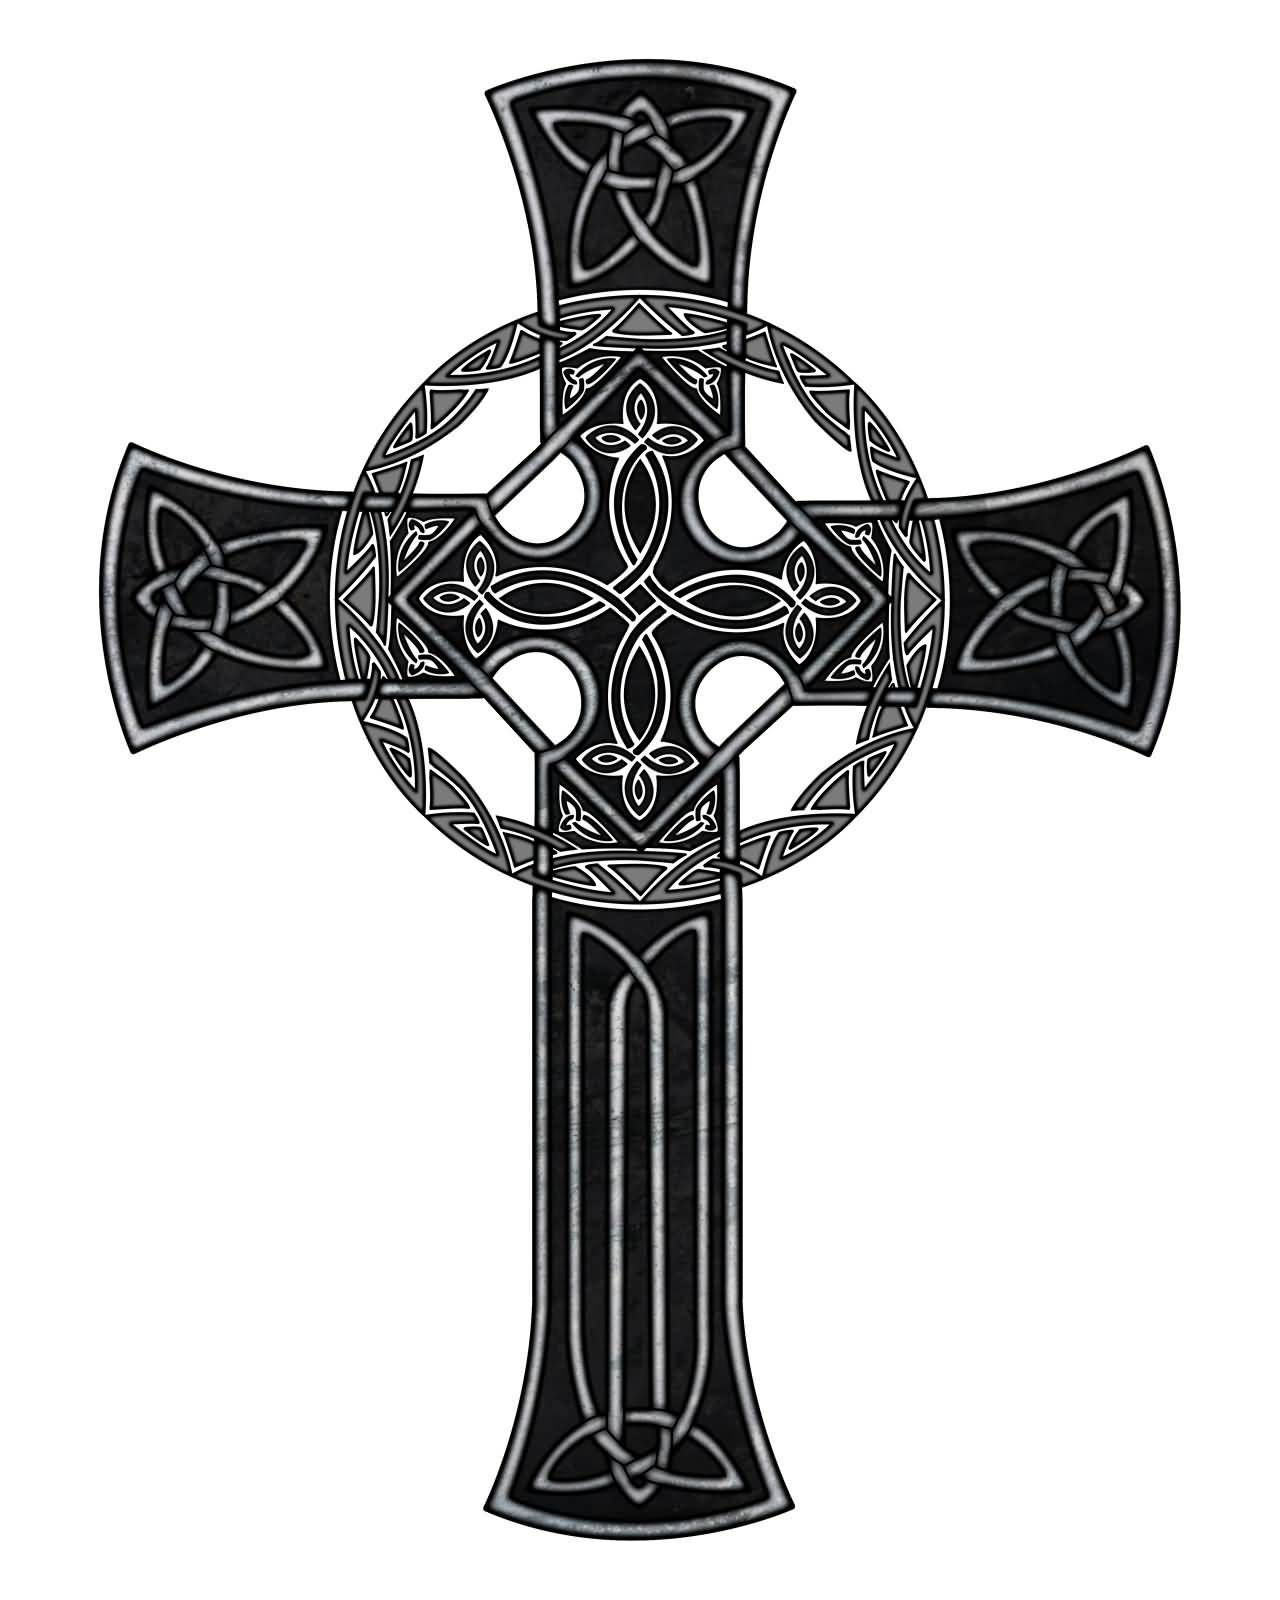 wonderful black celtic cross tattoo design tattoo pinterest celtic cross tattoos cross. Black Bedroom Furniture Sets. Home Design Ideas